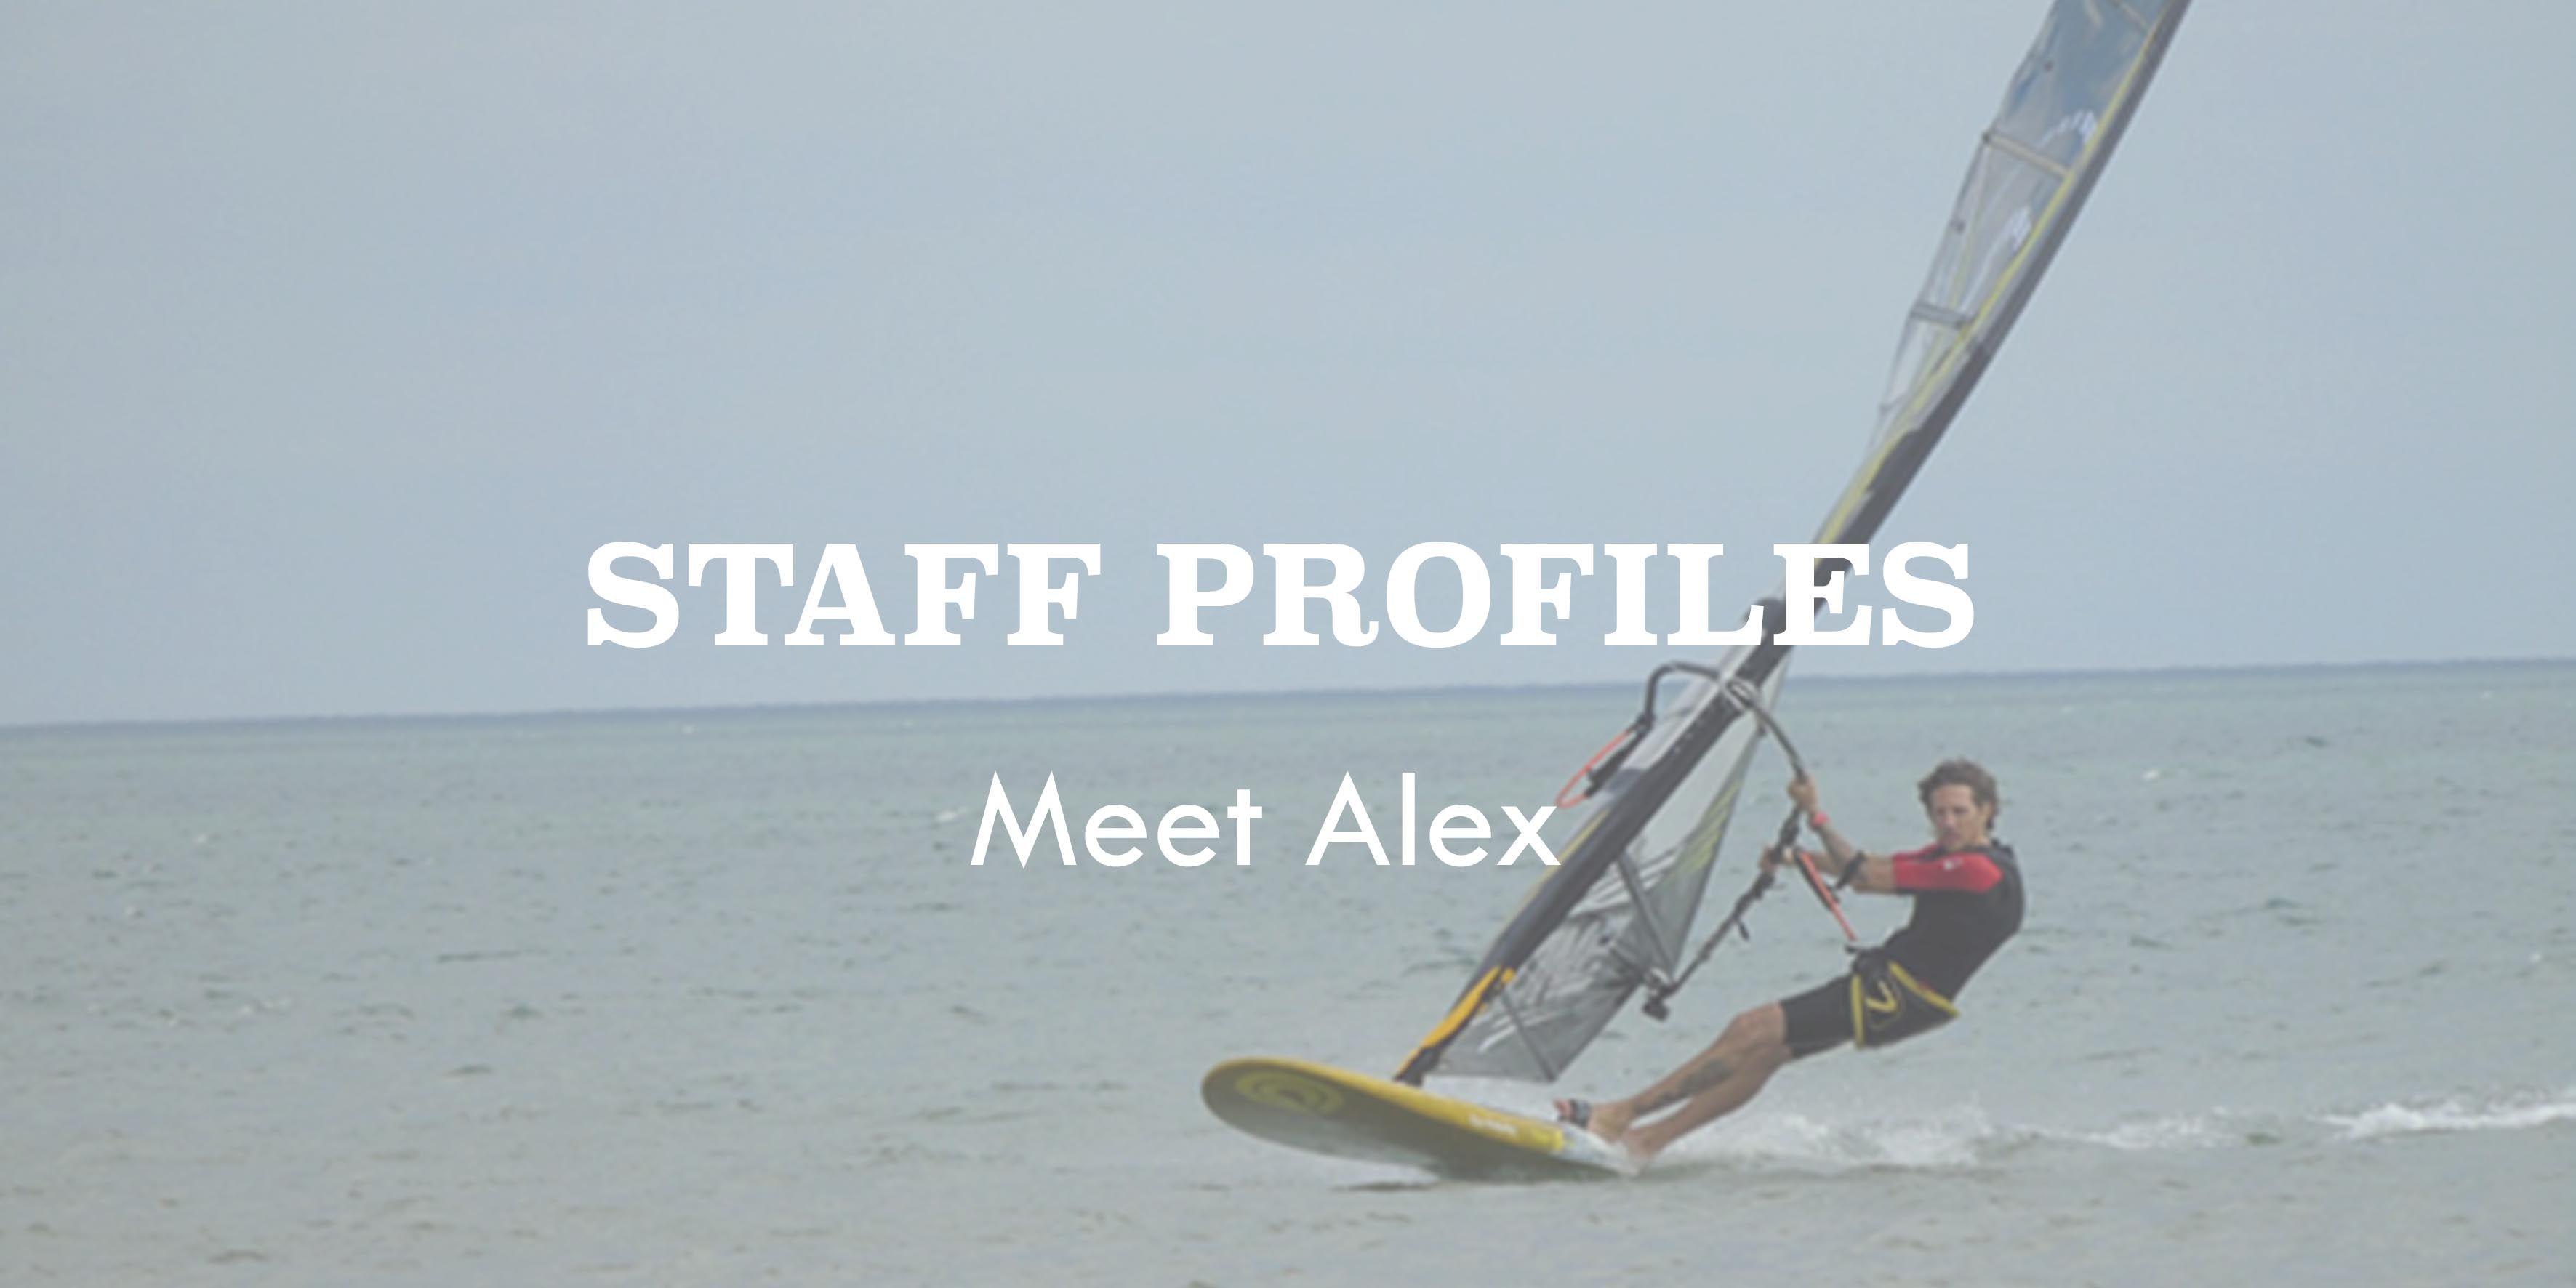 Staff Profile: Meet Alex